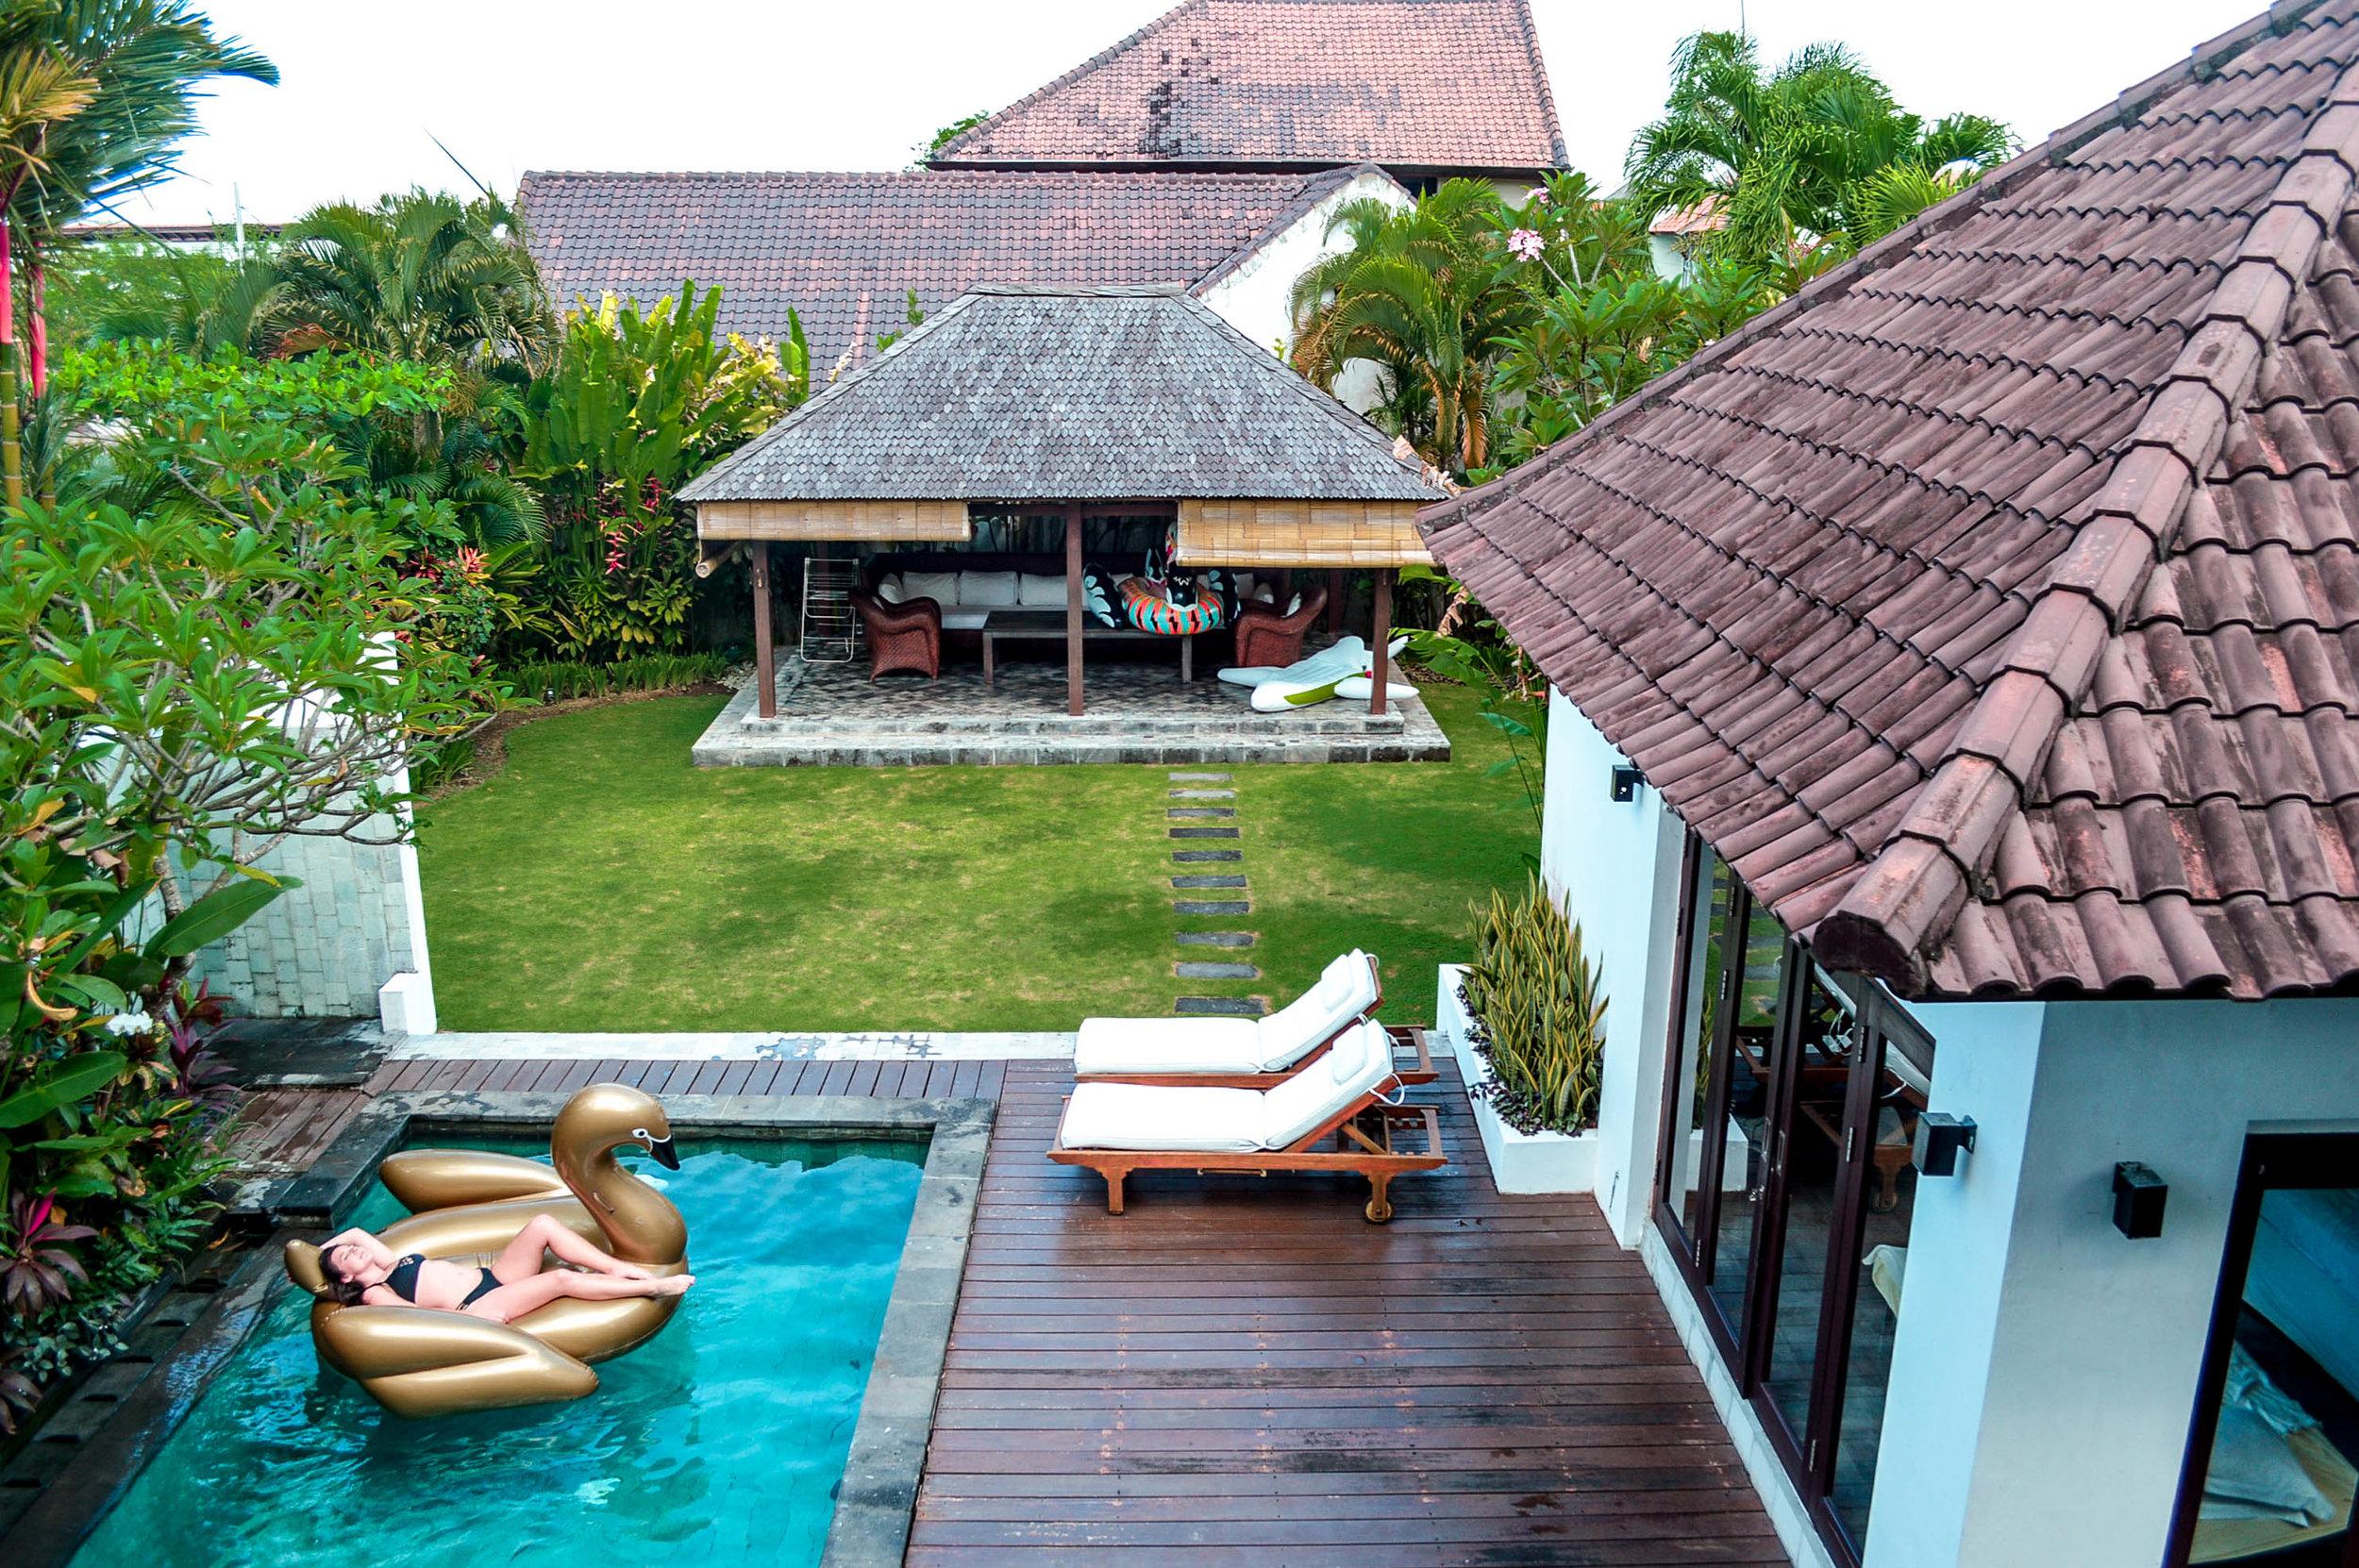 Bali-Villa-Canggu. / April 2018 roundup on goseekexplore.com